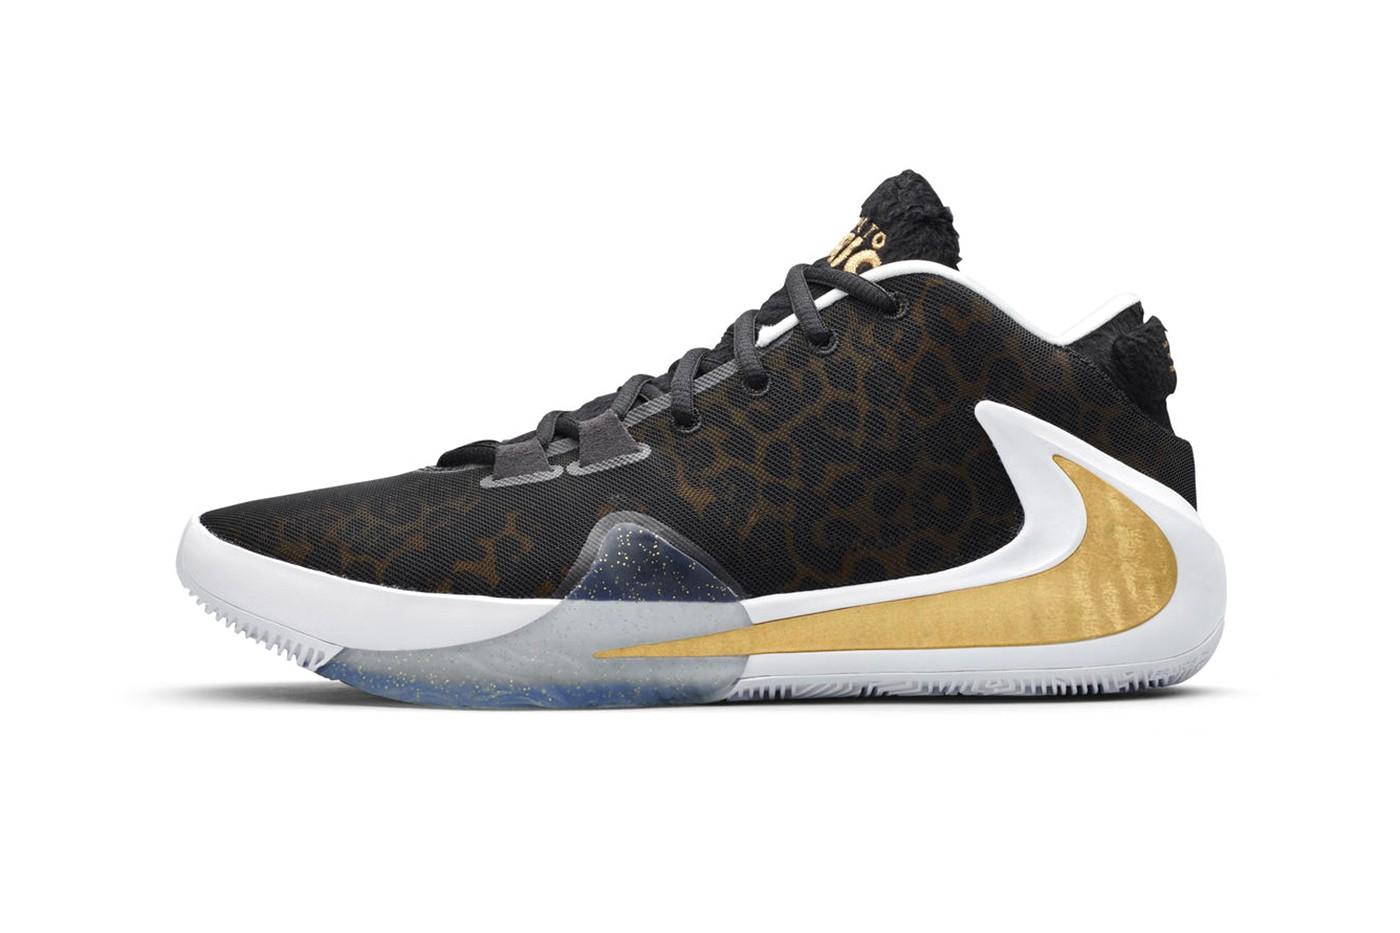 96b3b162 Giannis Antetokounmpo's Next Nike Zoom Freak 1 Colorway Pays Homage to  'Coming to America'